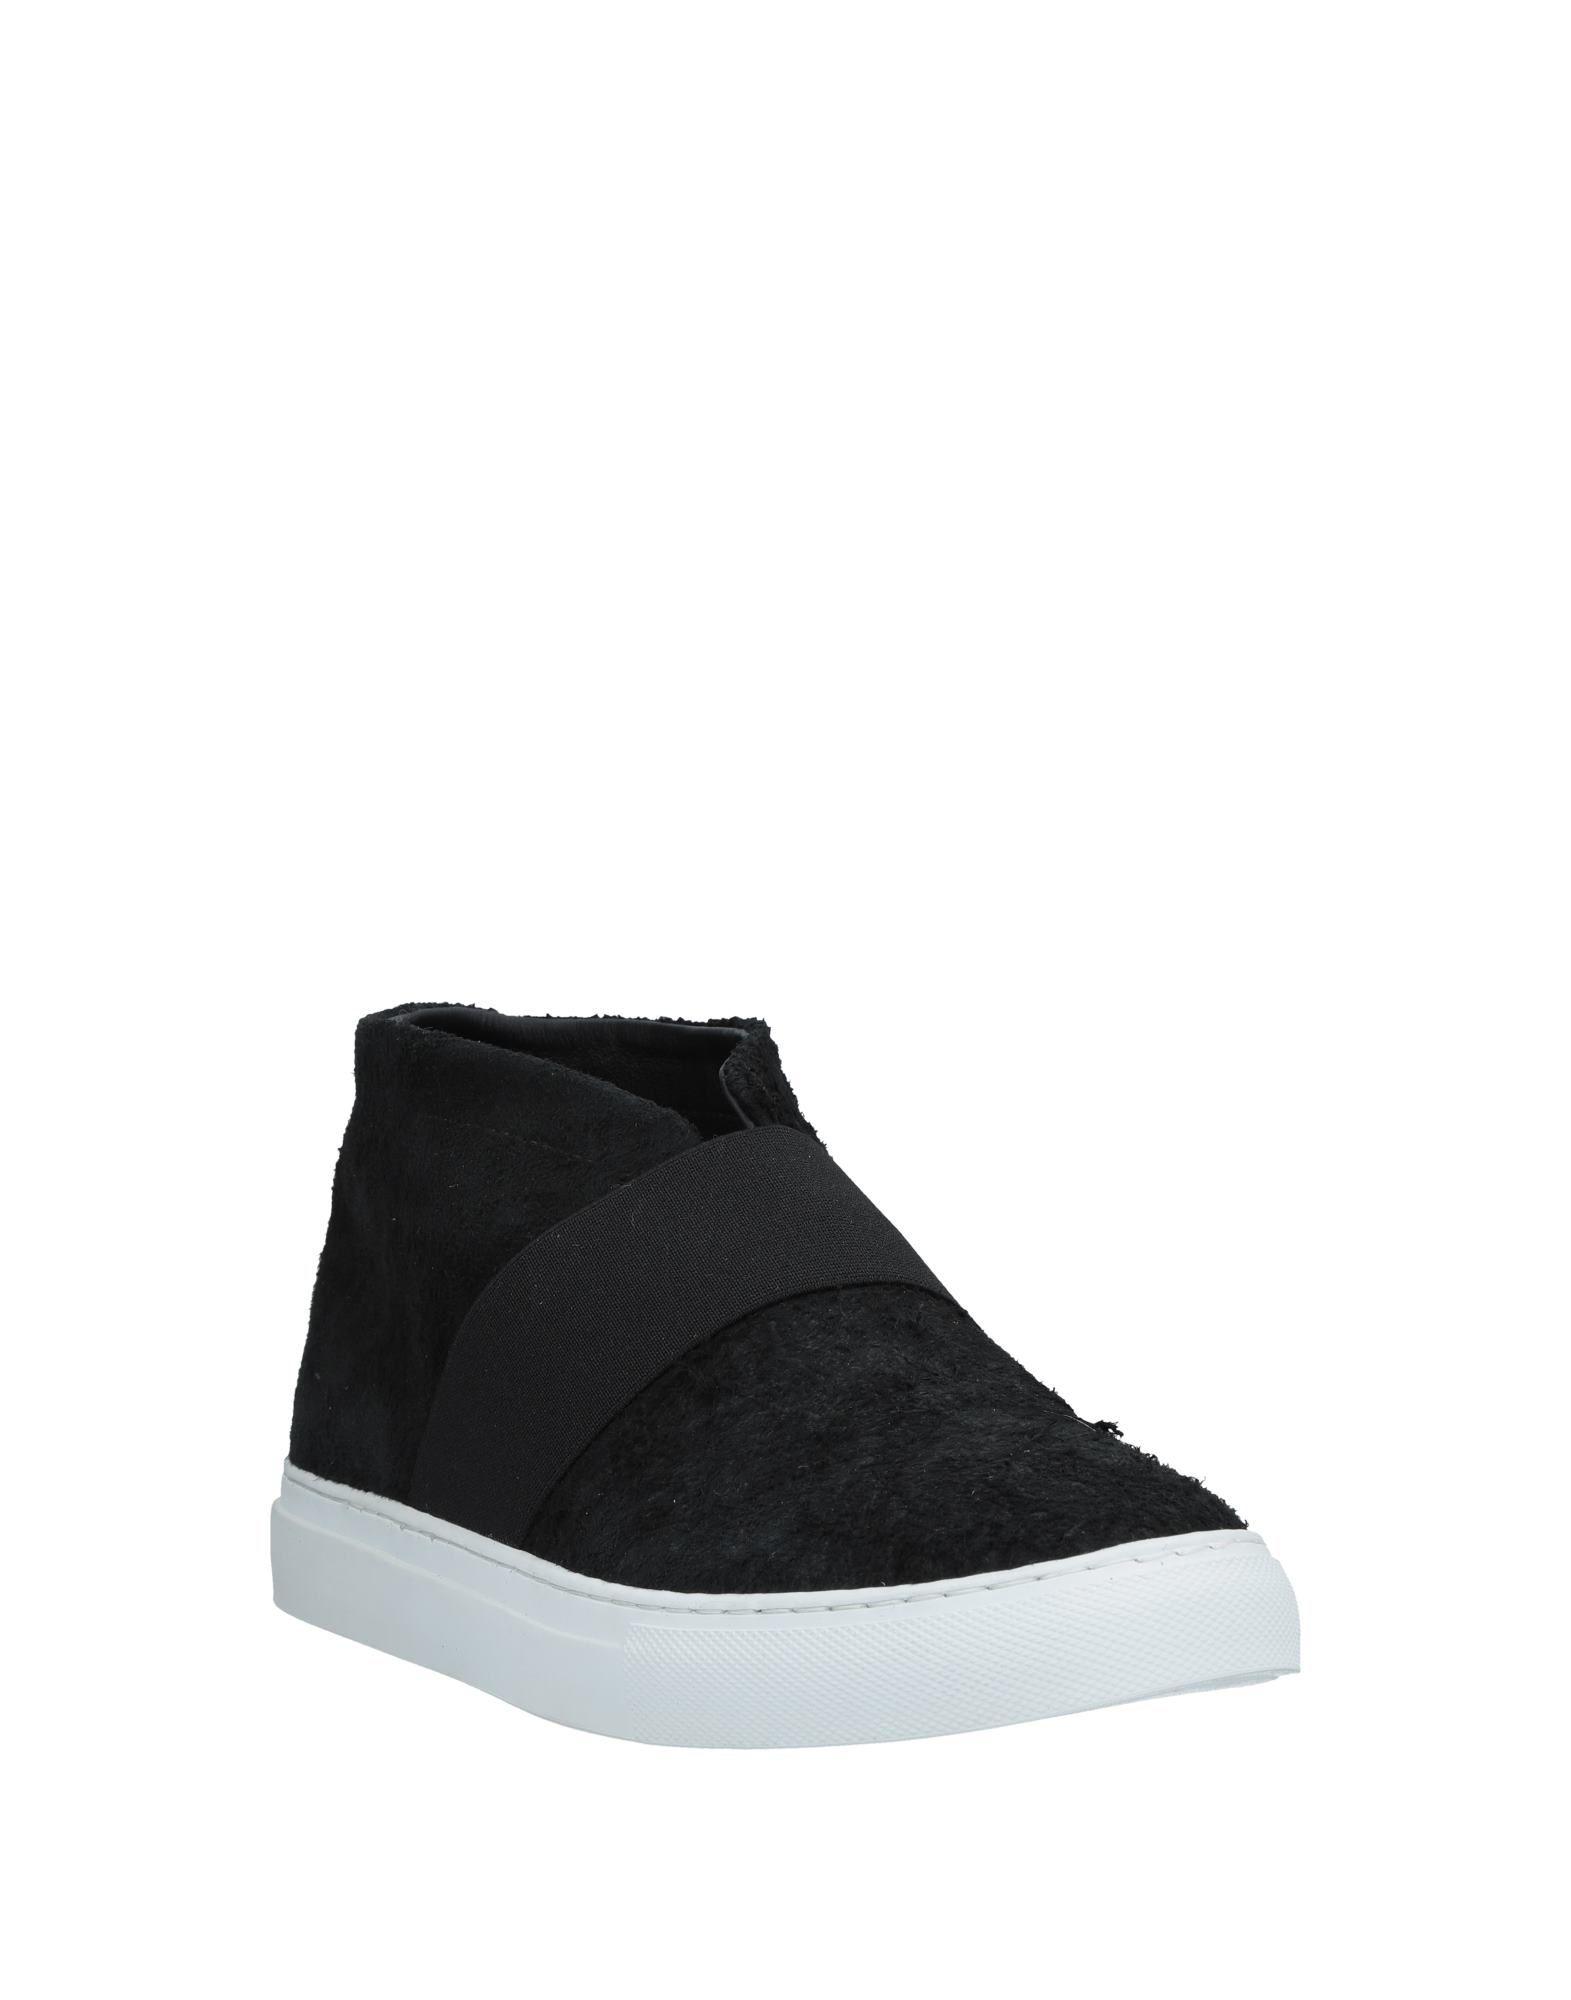 Diemme Sneakers Herren  11537764SI Gute Qualität beliebte Schuhe